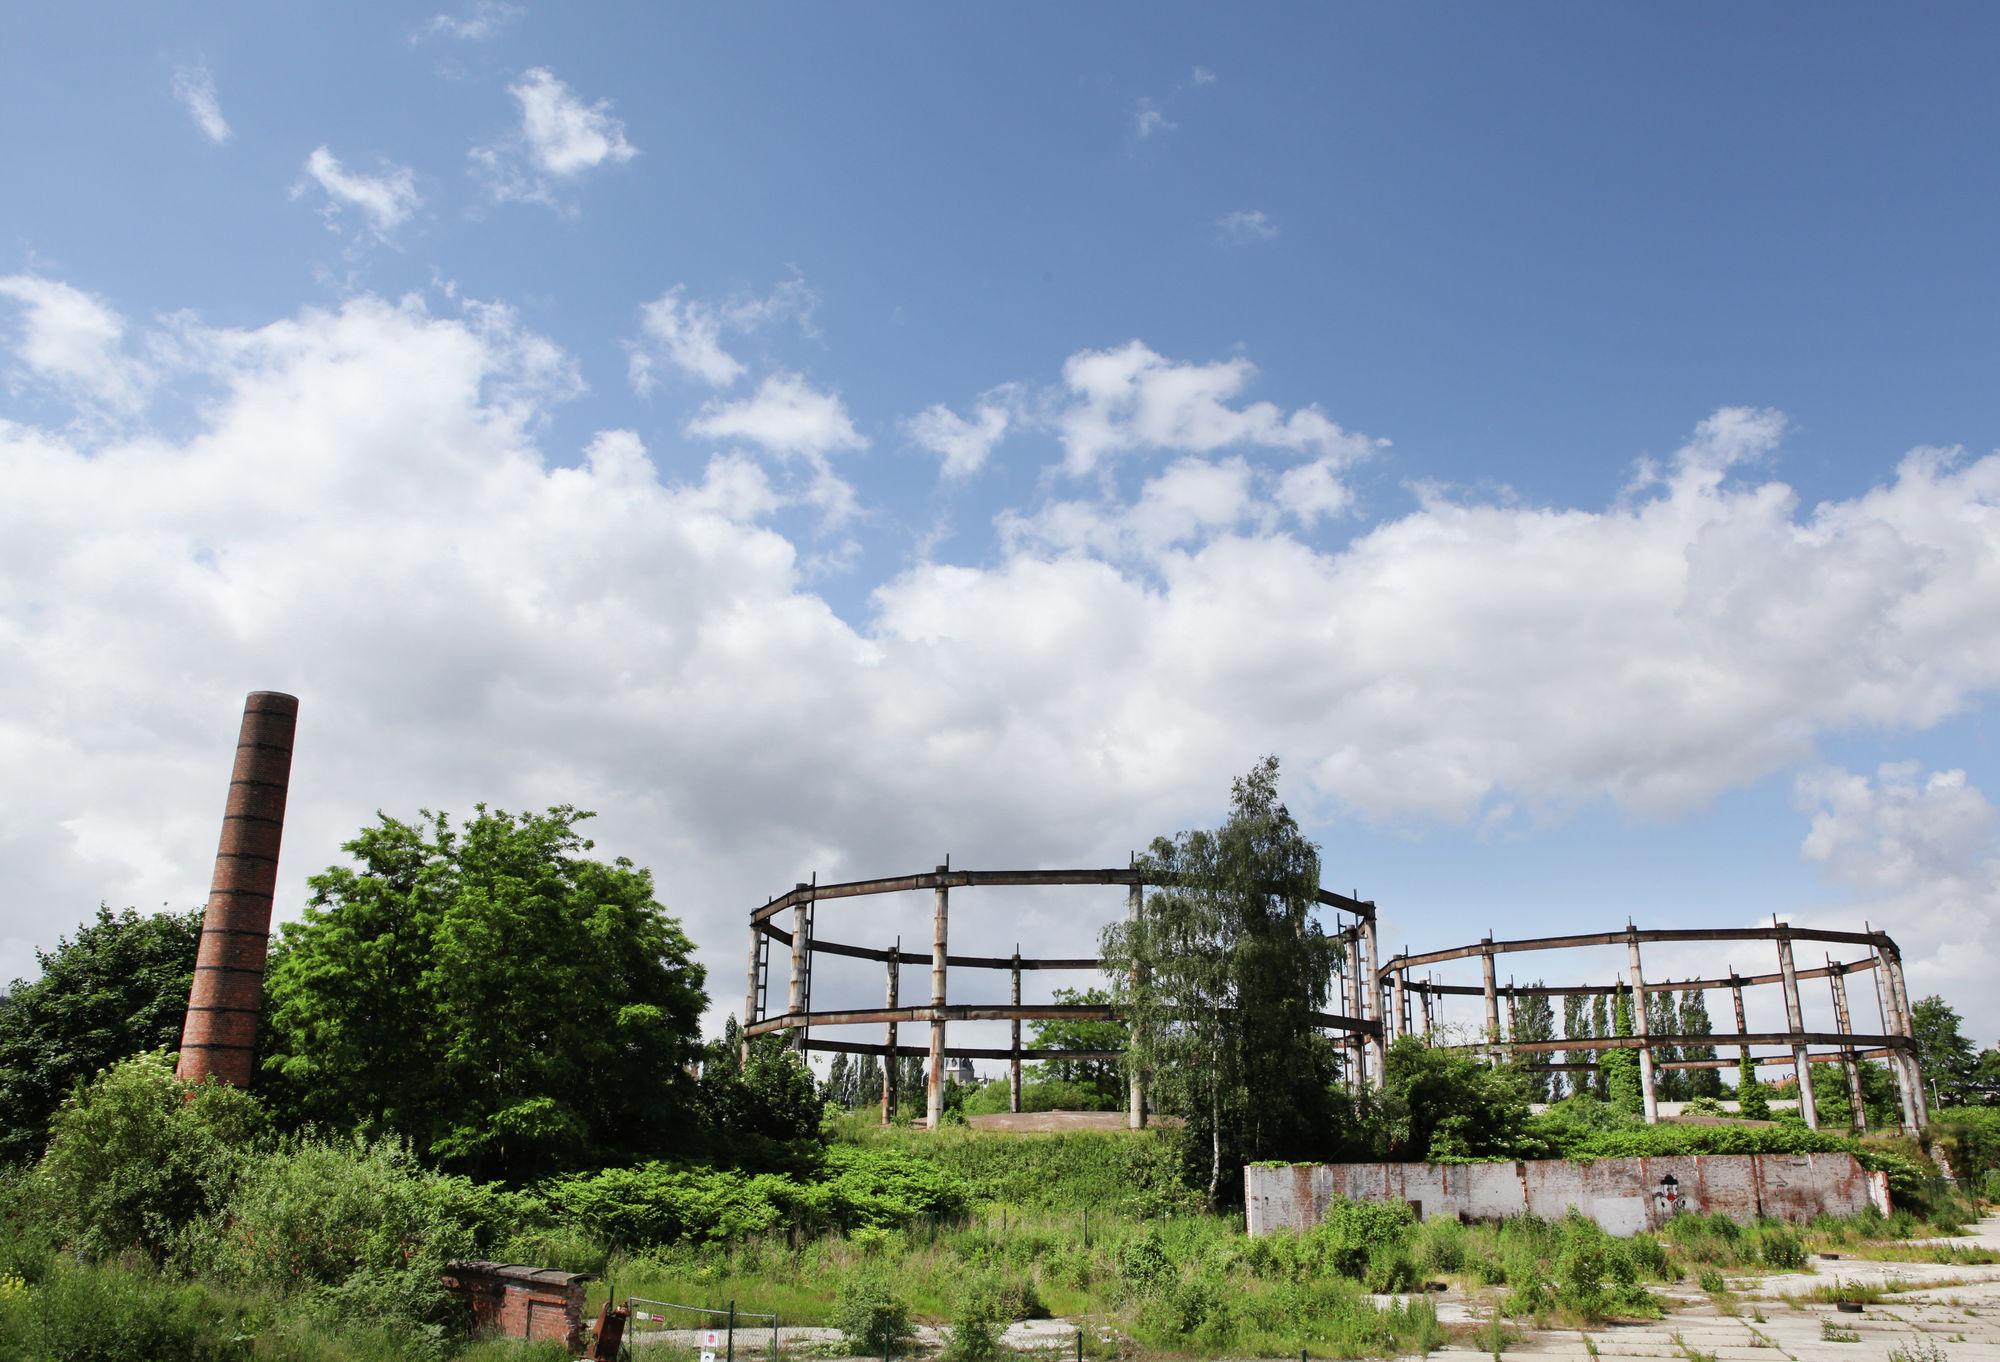 gaardeniersbrug en nieuwe molens (11)©Layla Aerts.jpg